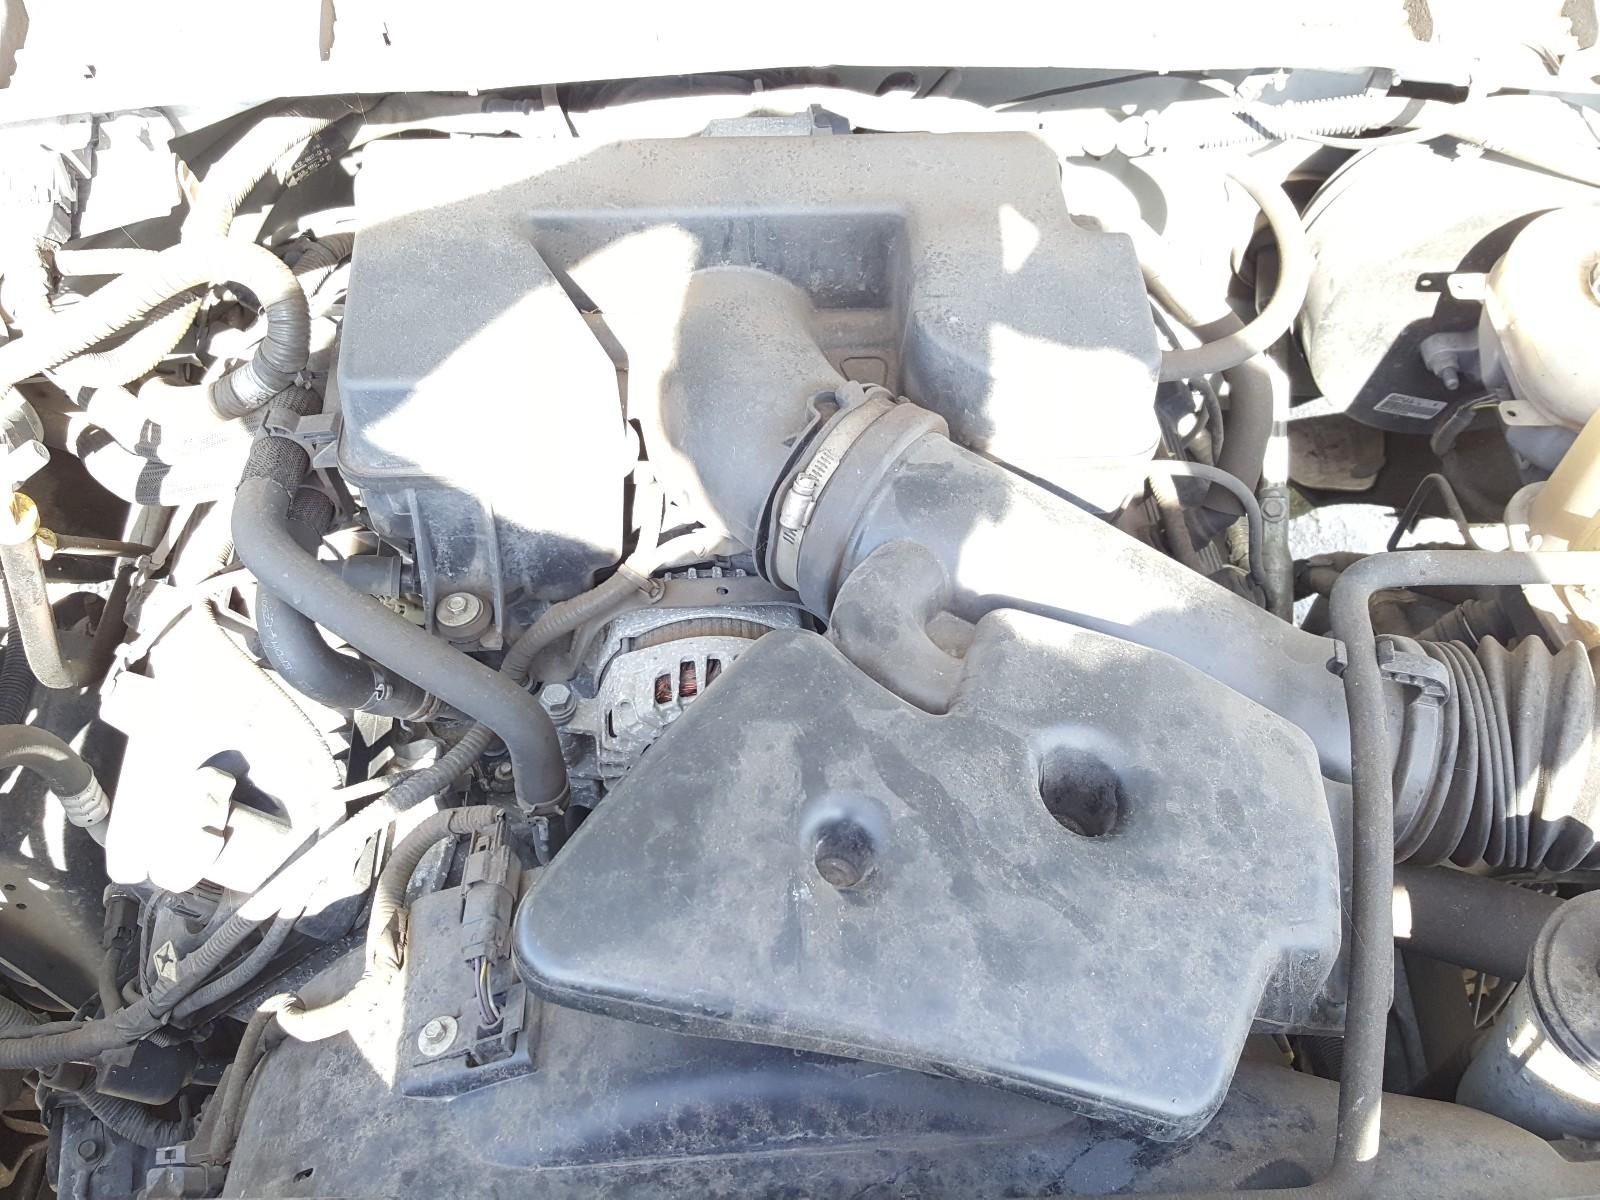 2012 Ford F250 Super 6.2L inside view